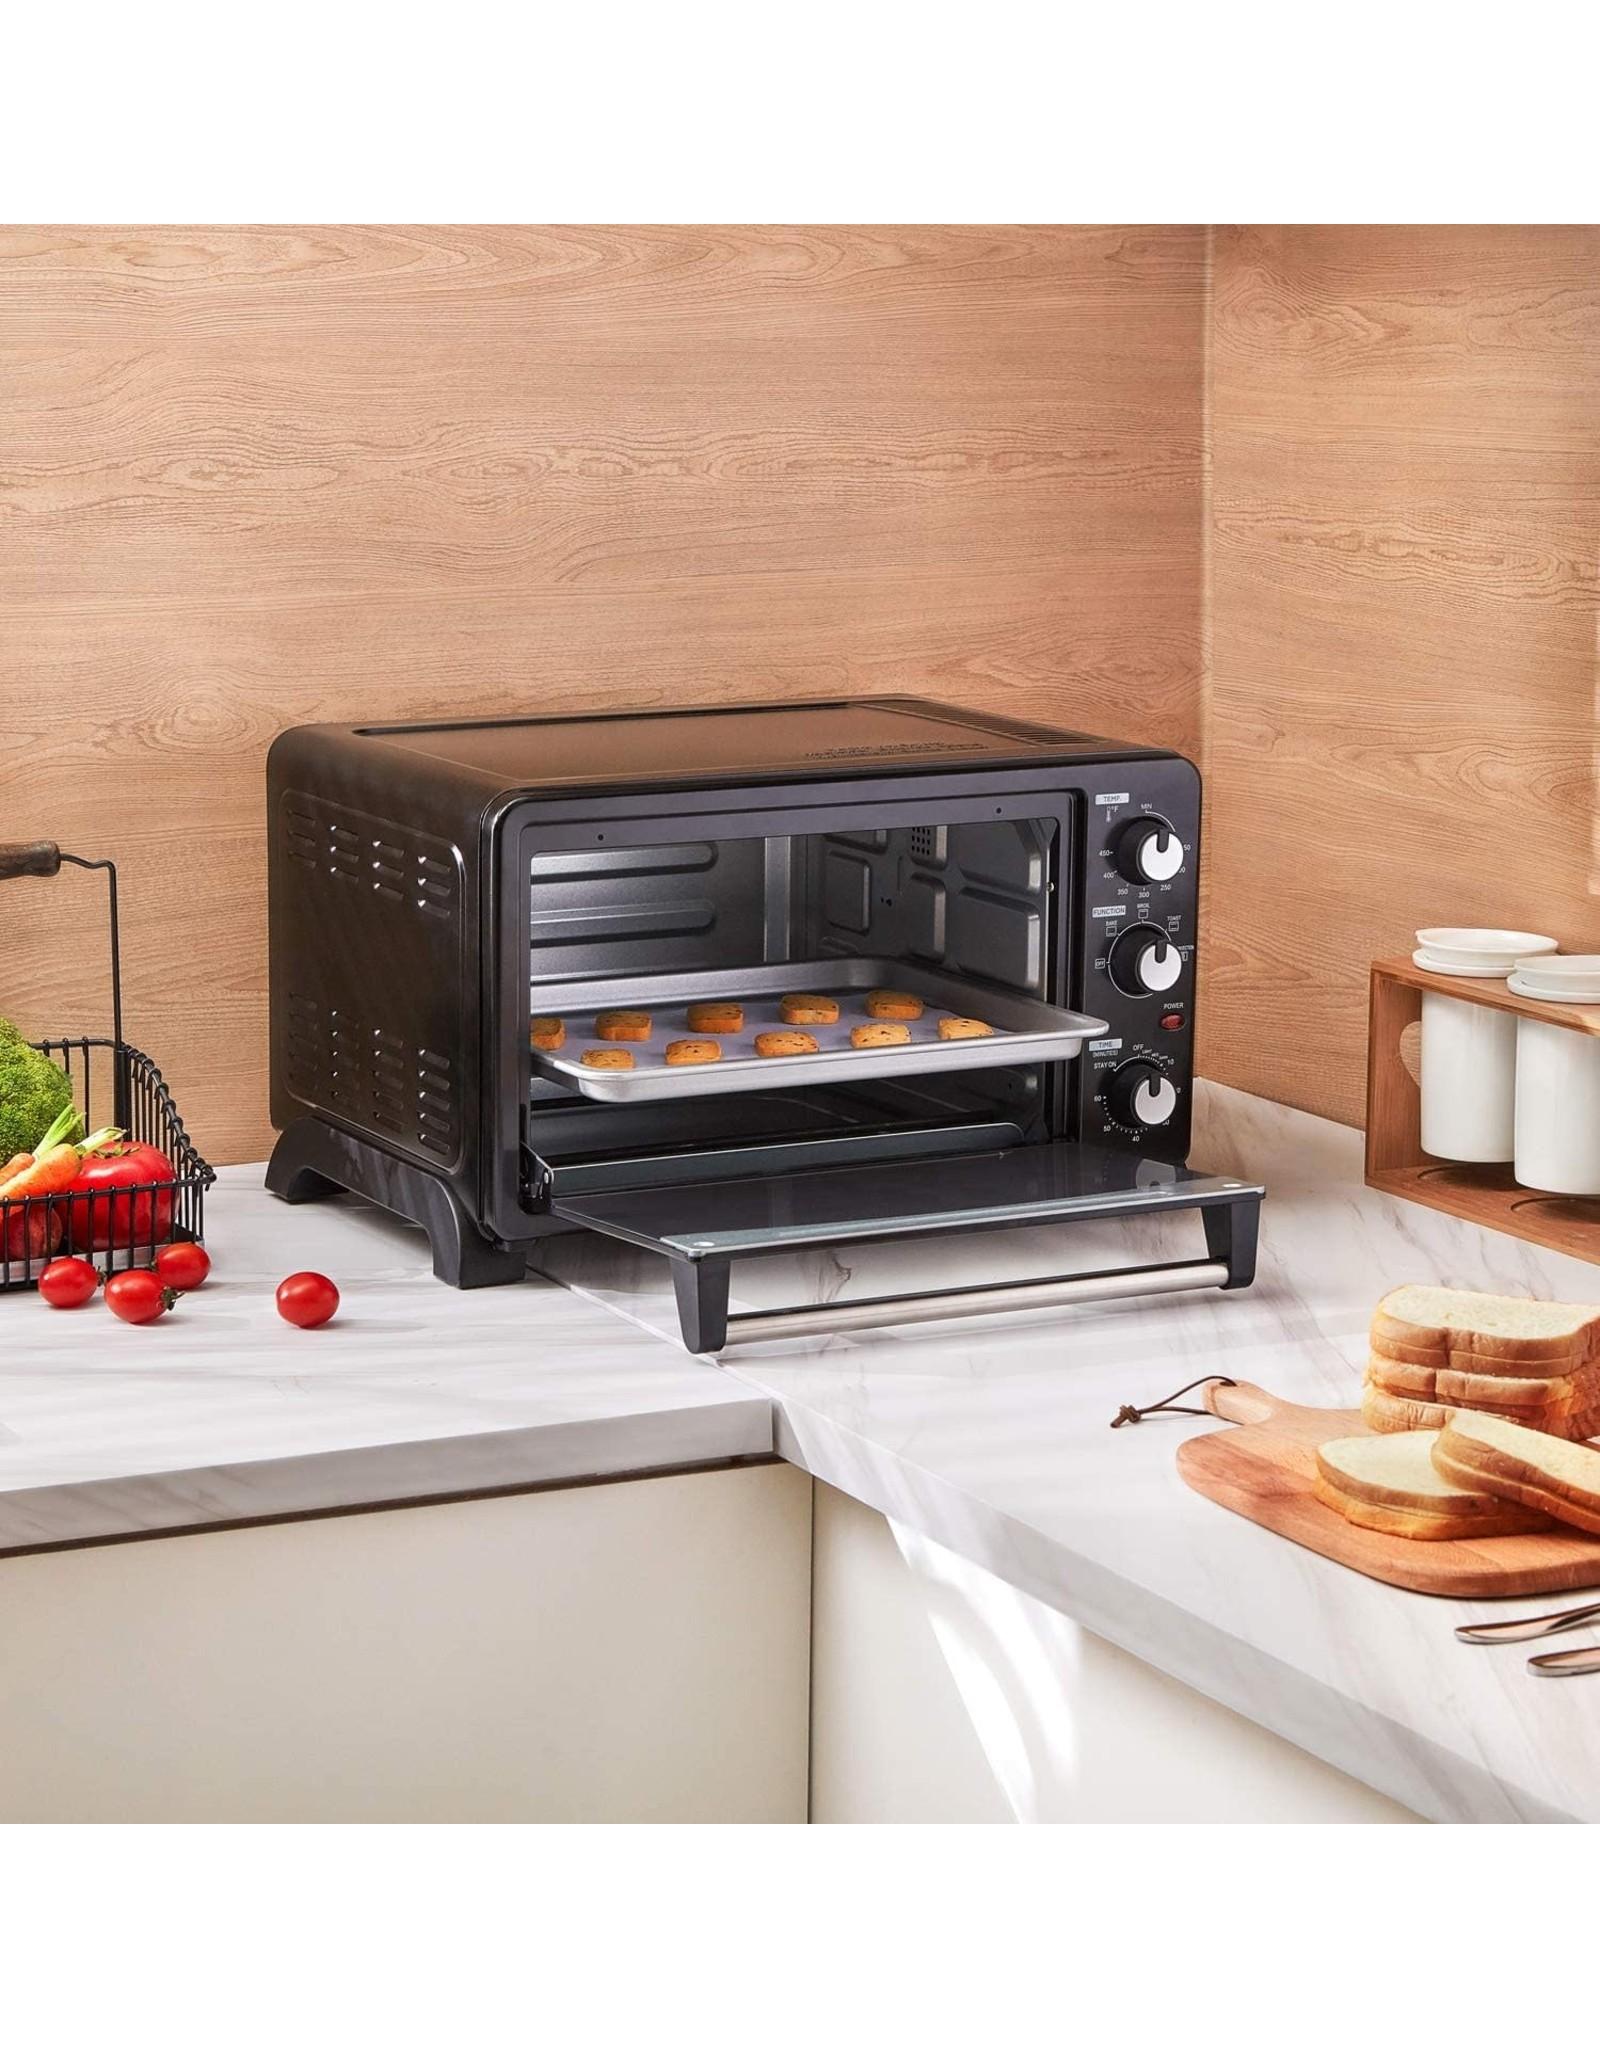 COMFEE' COMFEE' CFO-CC2501 Toaster Oven, 6-slice, Black